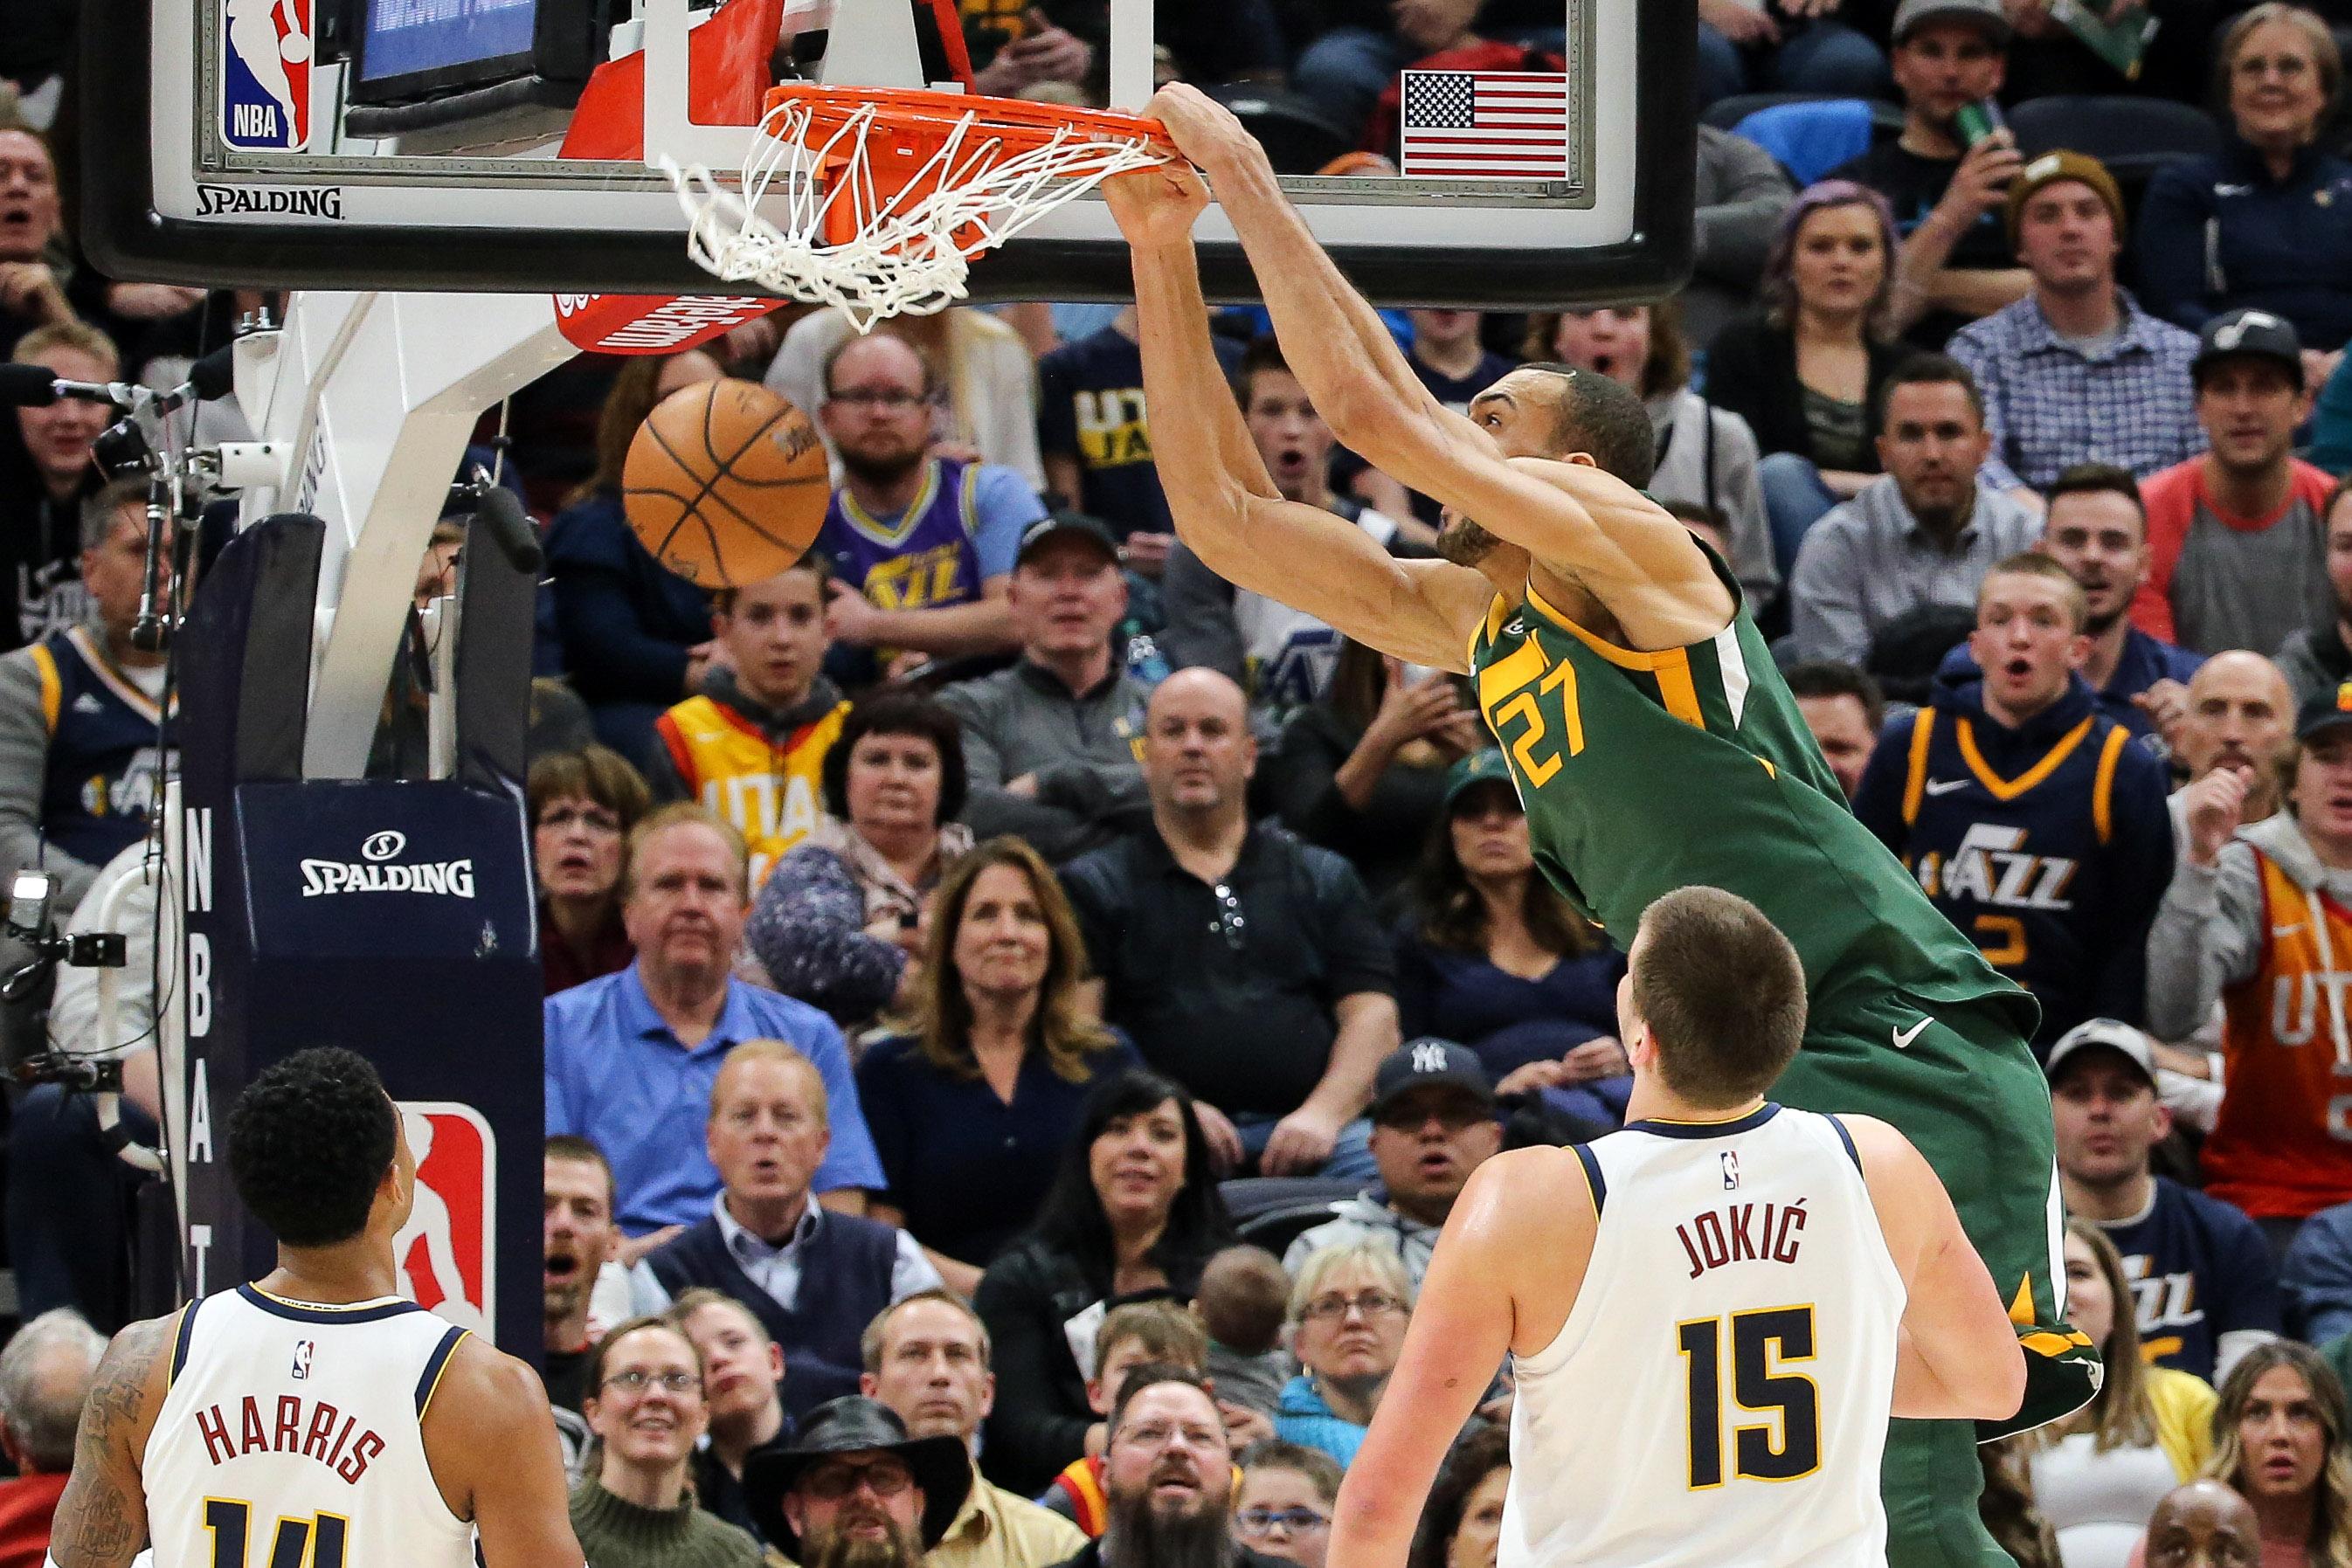 Utah Jazz center Rudy Gobert (27) dunks the basketball during the second quarter against the Denver Nuggets at Vivint Smart Home Arena.